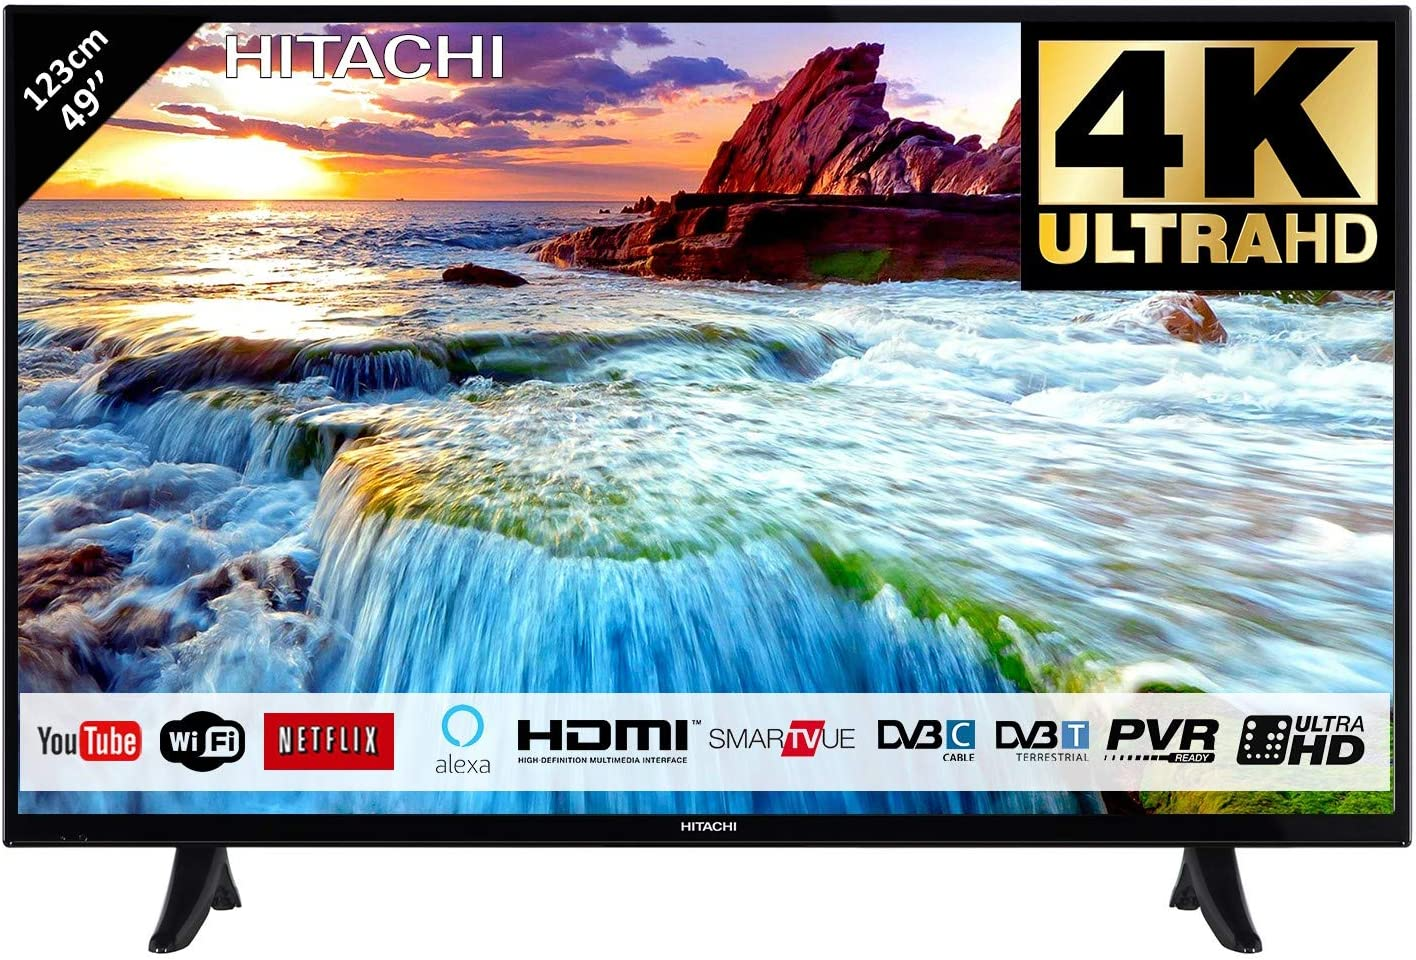 Hitachi 49F501HK5000 TV (123 cm) mpeg4 50 Hz: Amazon.es: Electrónica